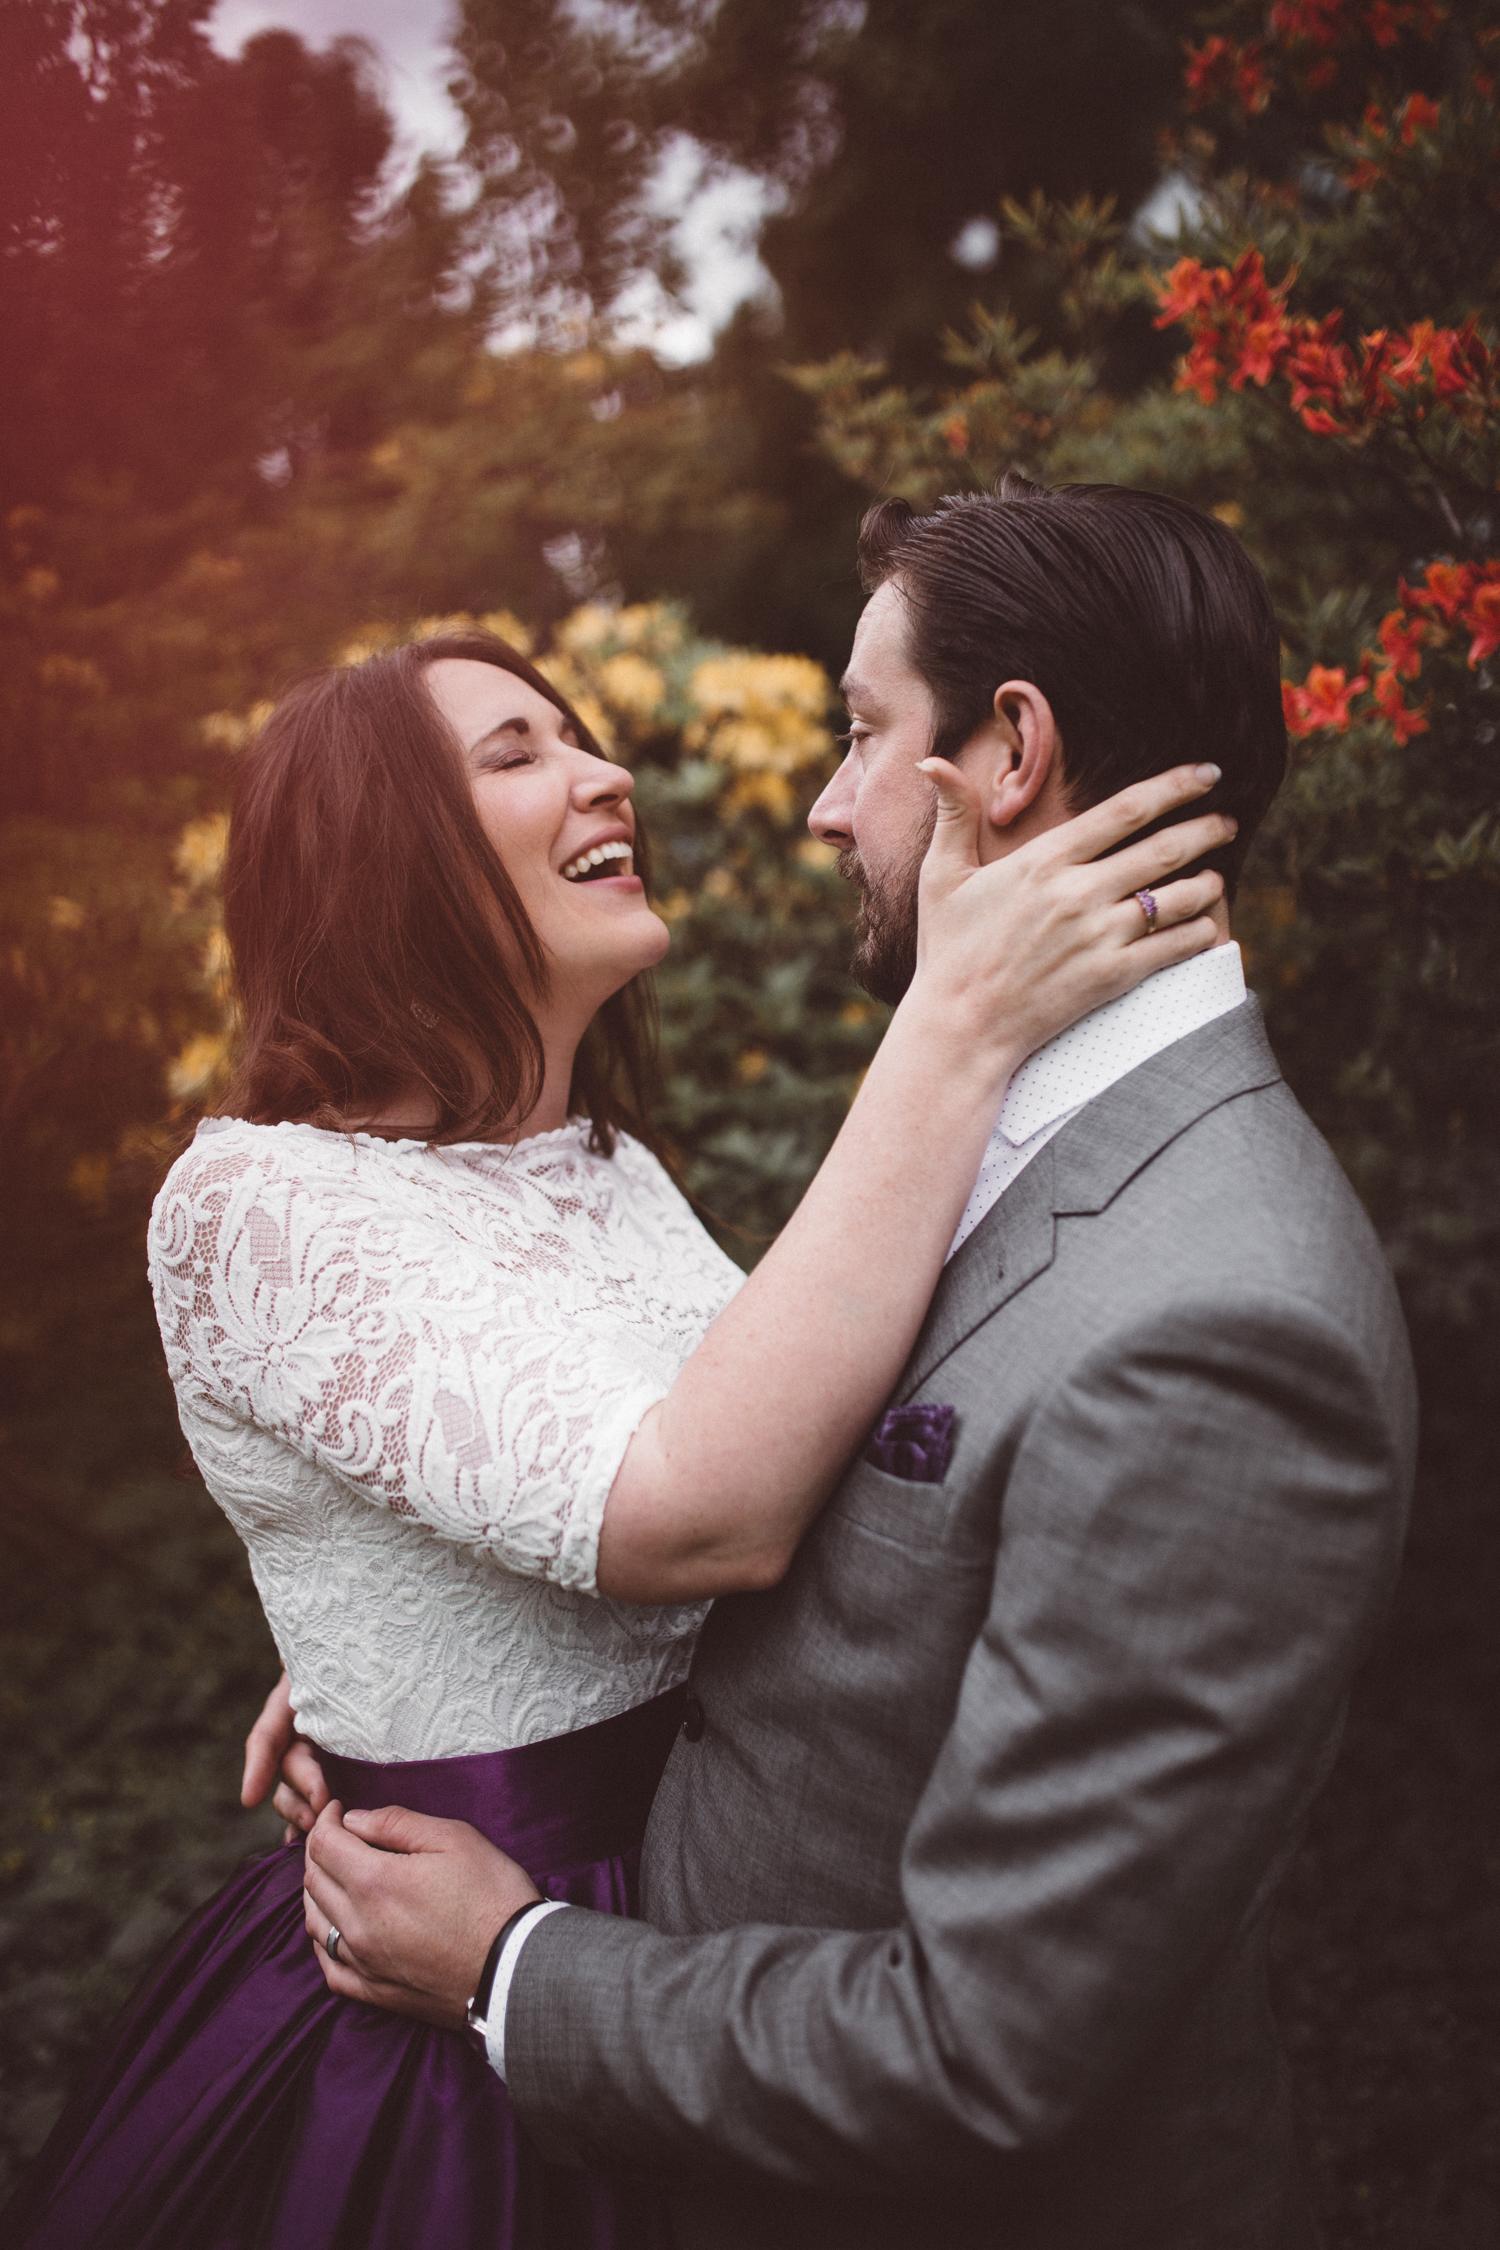 kdp_courtney&sean_wed_web-47.jpg